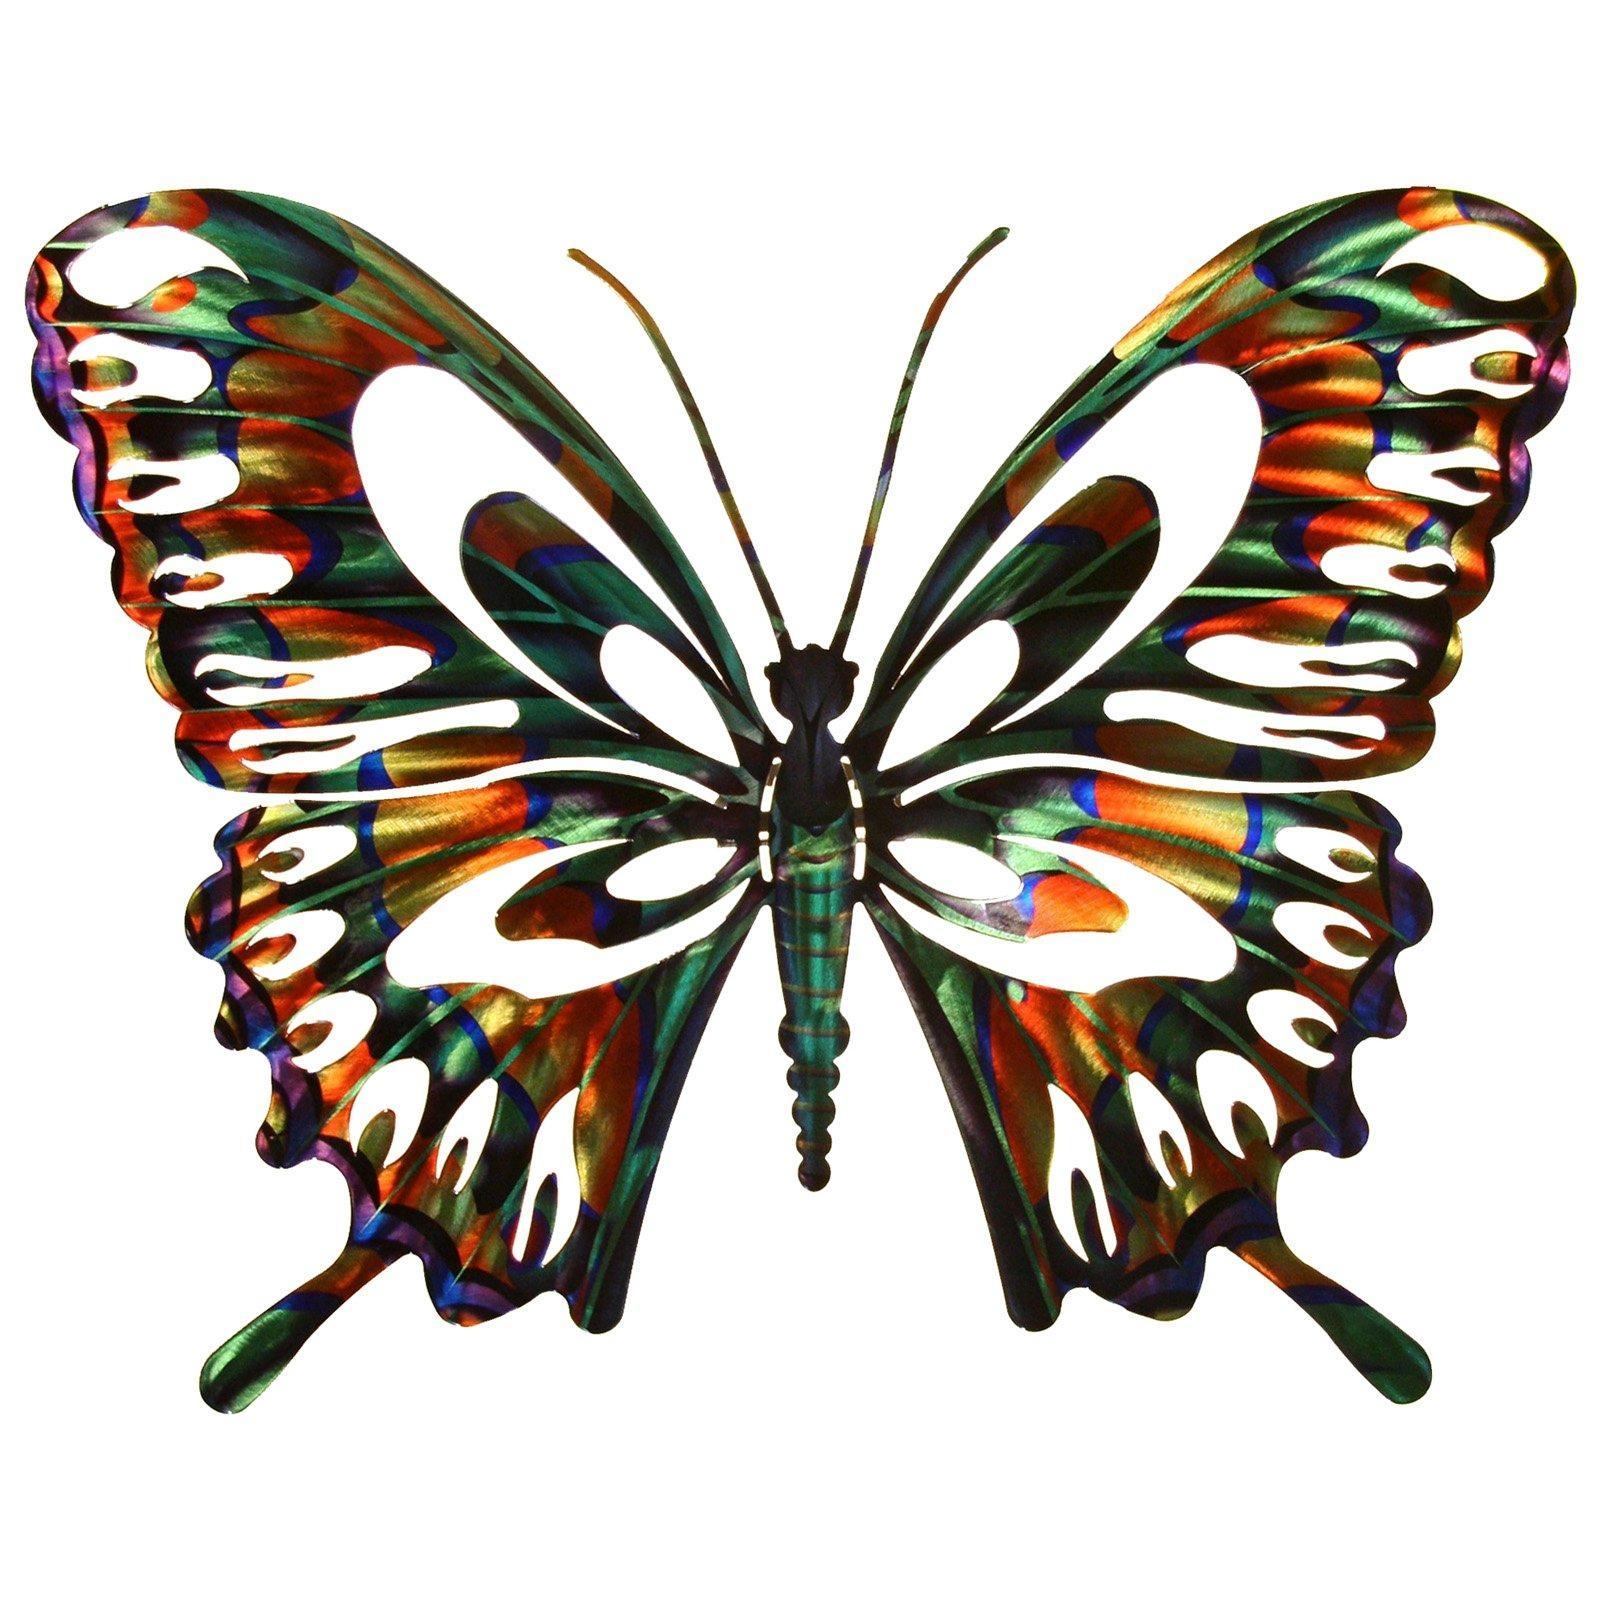 3D Butterfly Metal Outdoor Wall Art | Hayneedle Regarding Large Metal Butterfly Wall Art (Image 1 of 20)